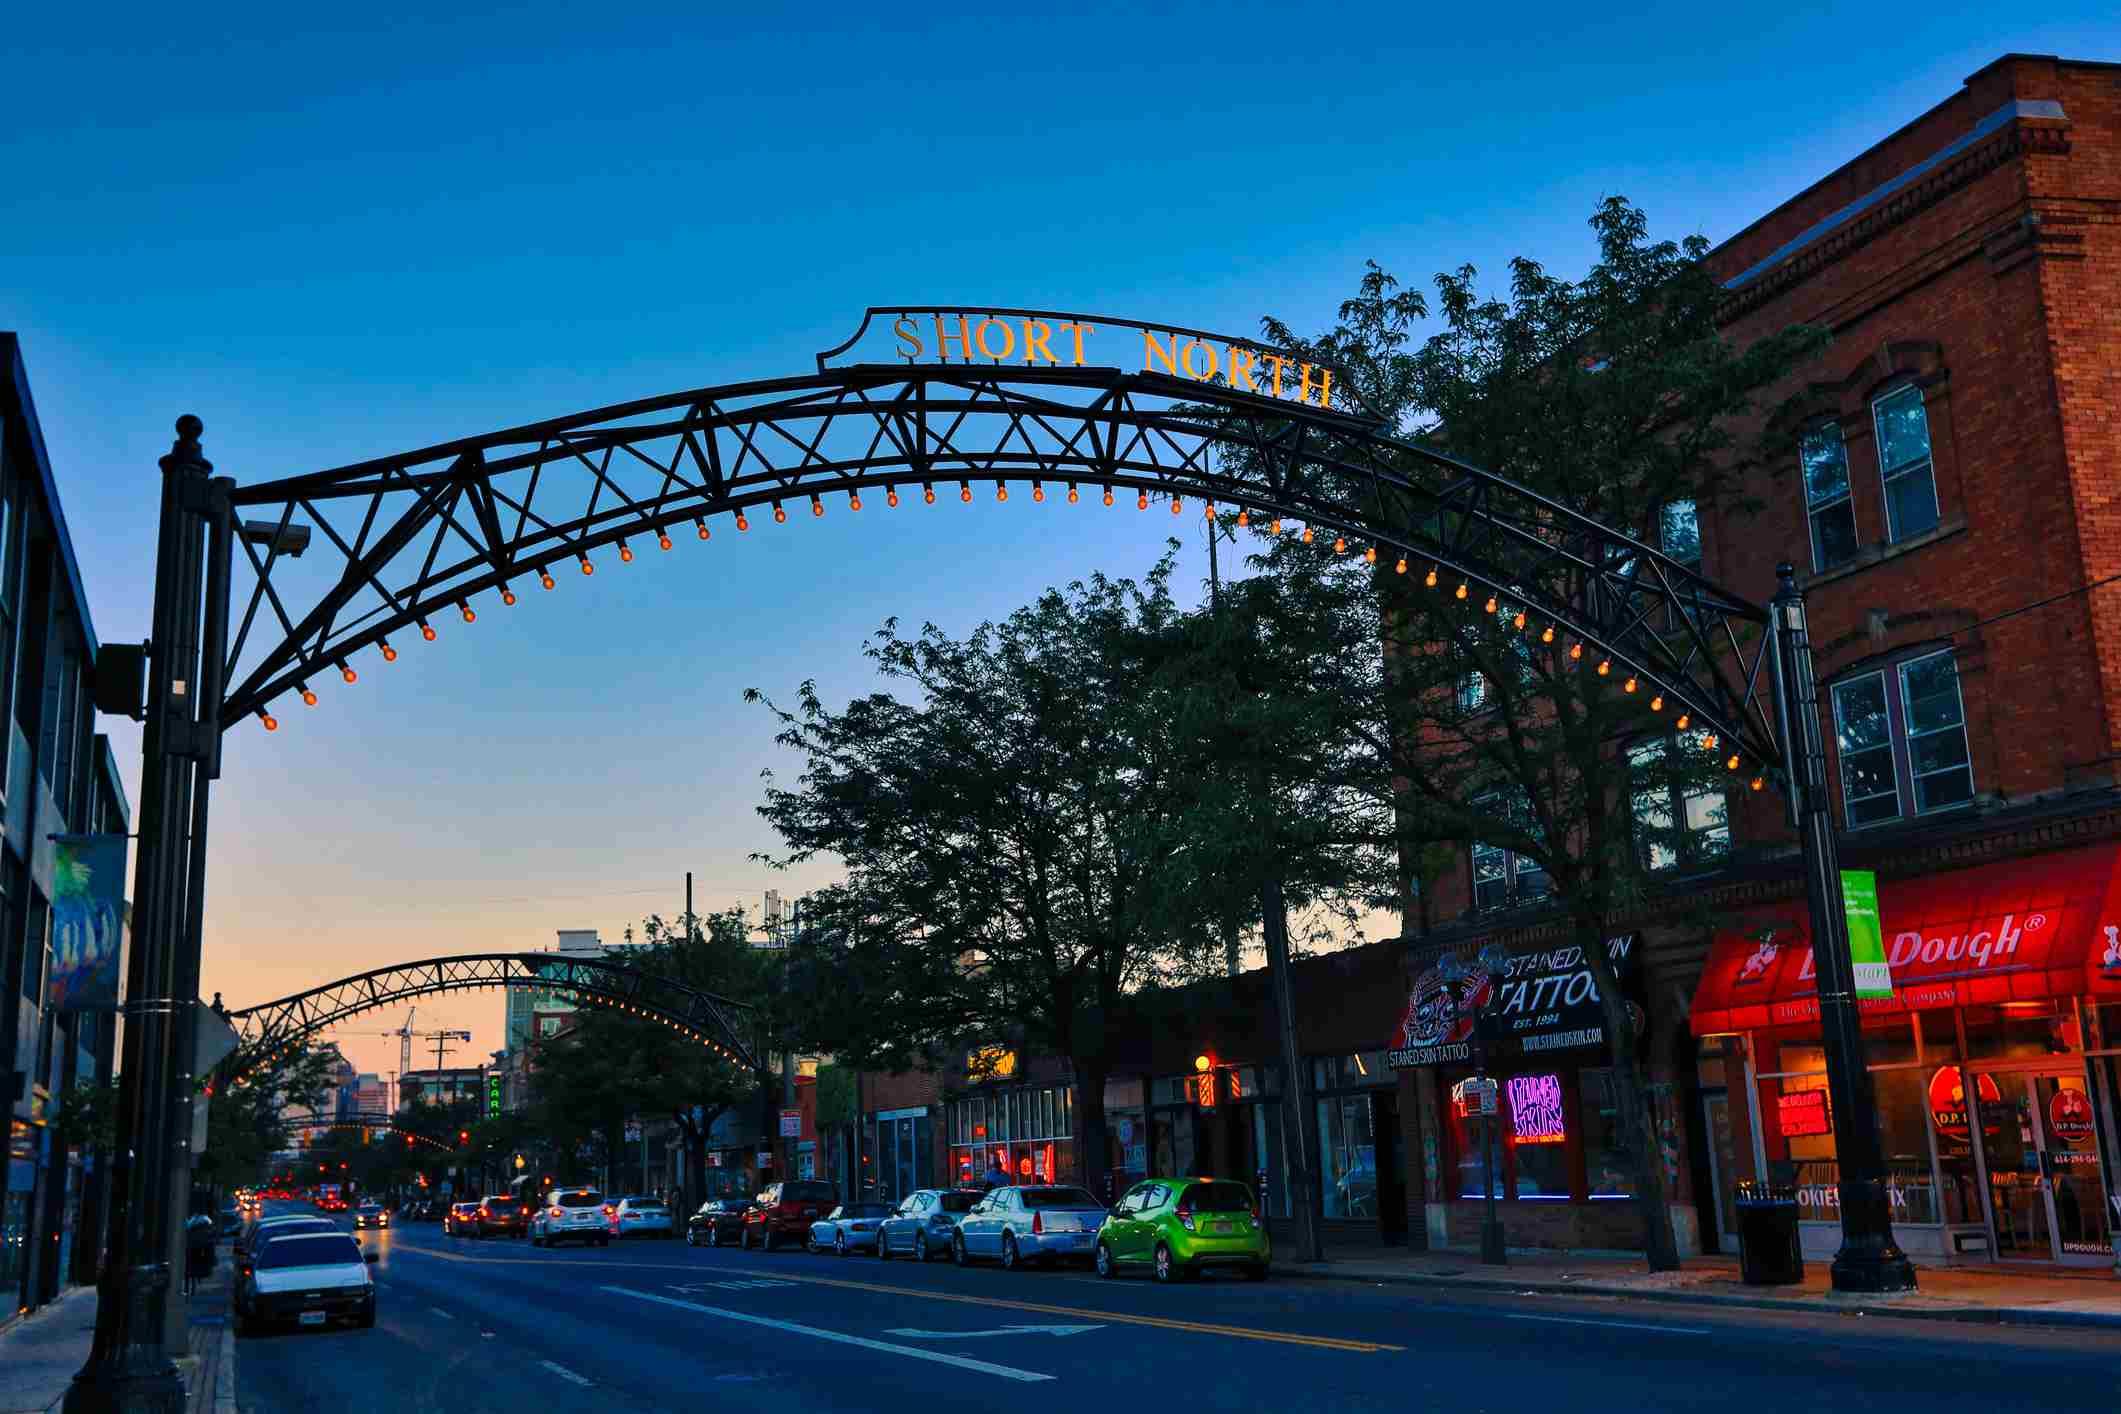 The Vibrant Short North Arts District in Columbus, Ohio